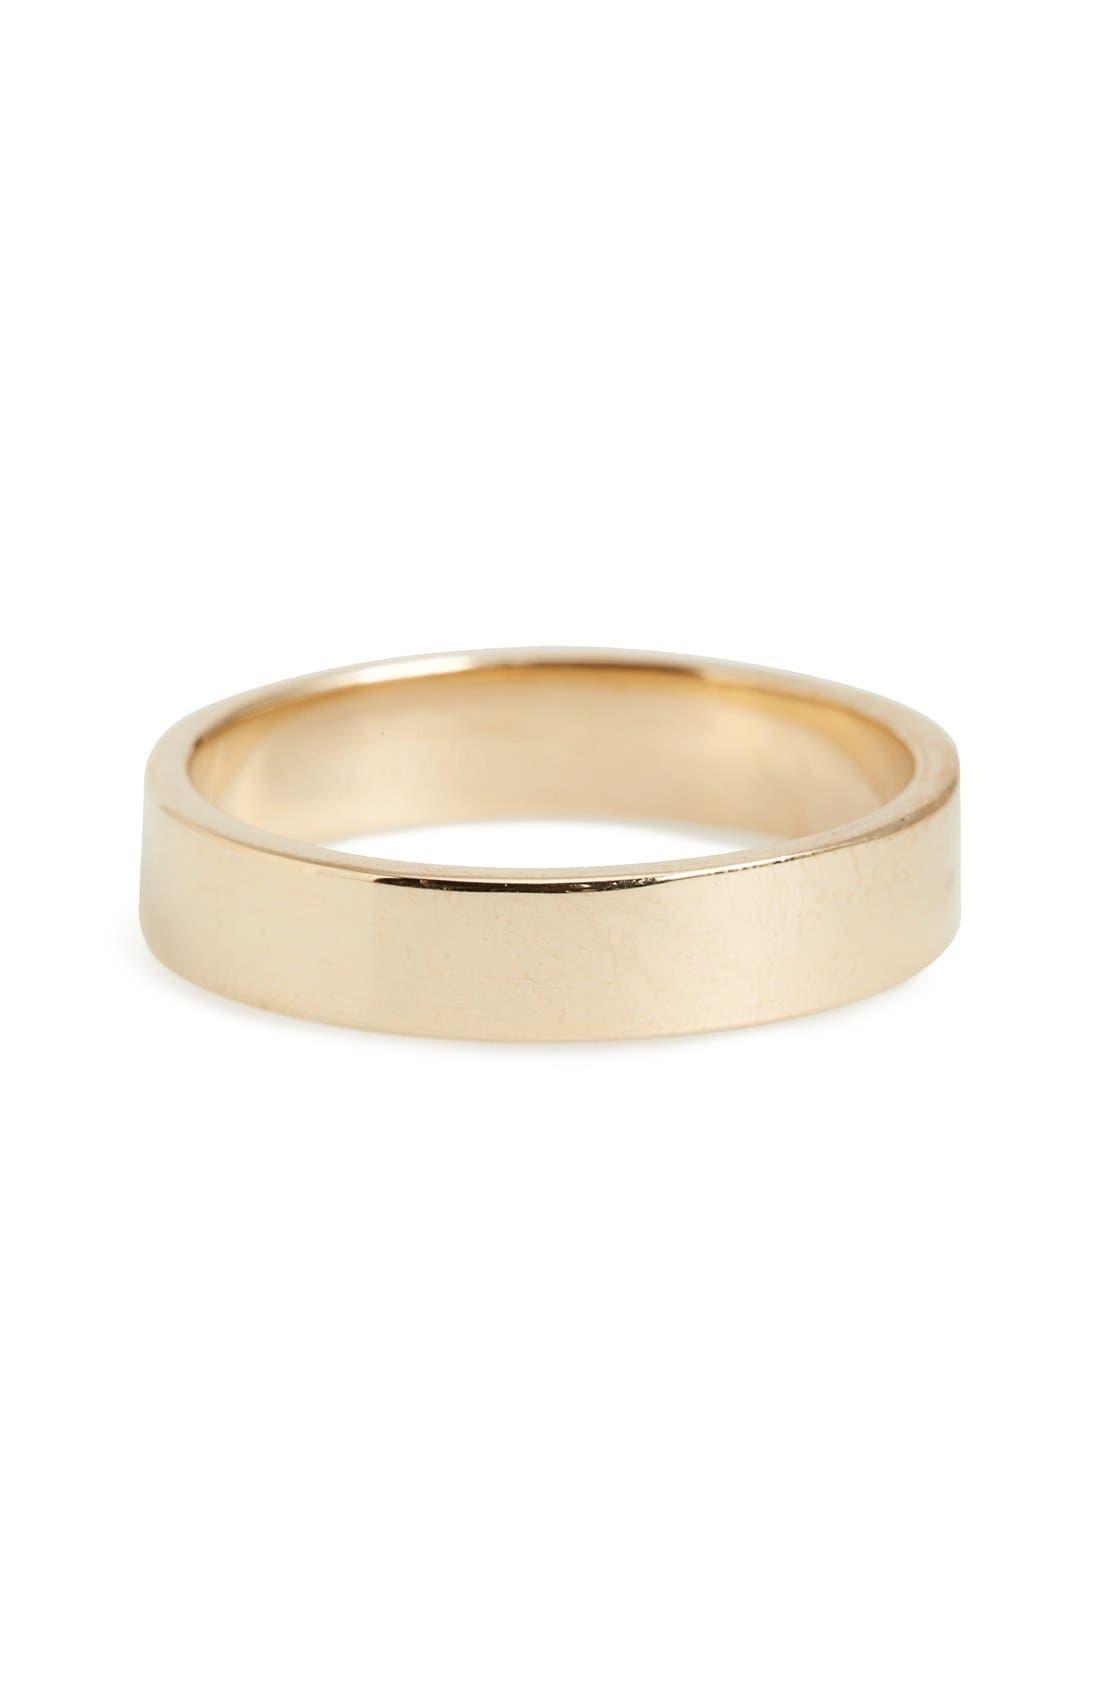 Harmony<sup>®</sup> Flat Classic 4mm Shiny Band Ring,                             Main thumbnail 1, color,                             Yellow